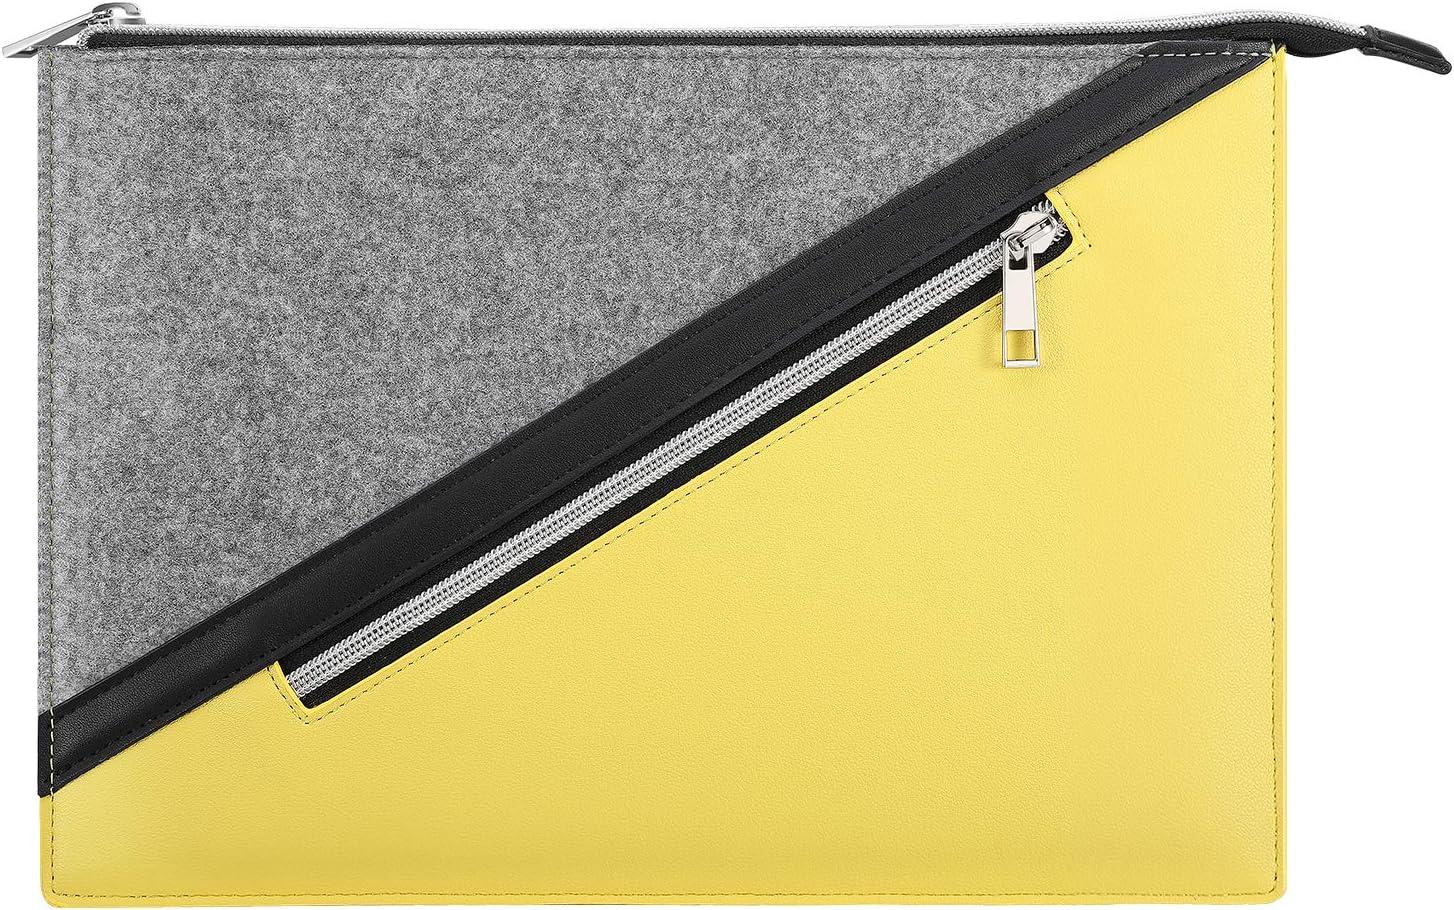 "MoKo 13.3 Inch Laptop Sleeve, Laptop Briefcase Bag Zipper Pouch with Pocket Fits MacBook Pro 13"" 2012-2015, MacBook Air 13"" 2012-2017, iPad Pro 12.9"" 2018/2020, Google Pixel Slate 12.3"" 2018 - Yellow"